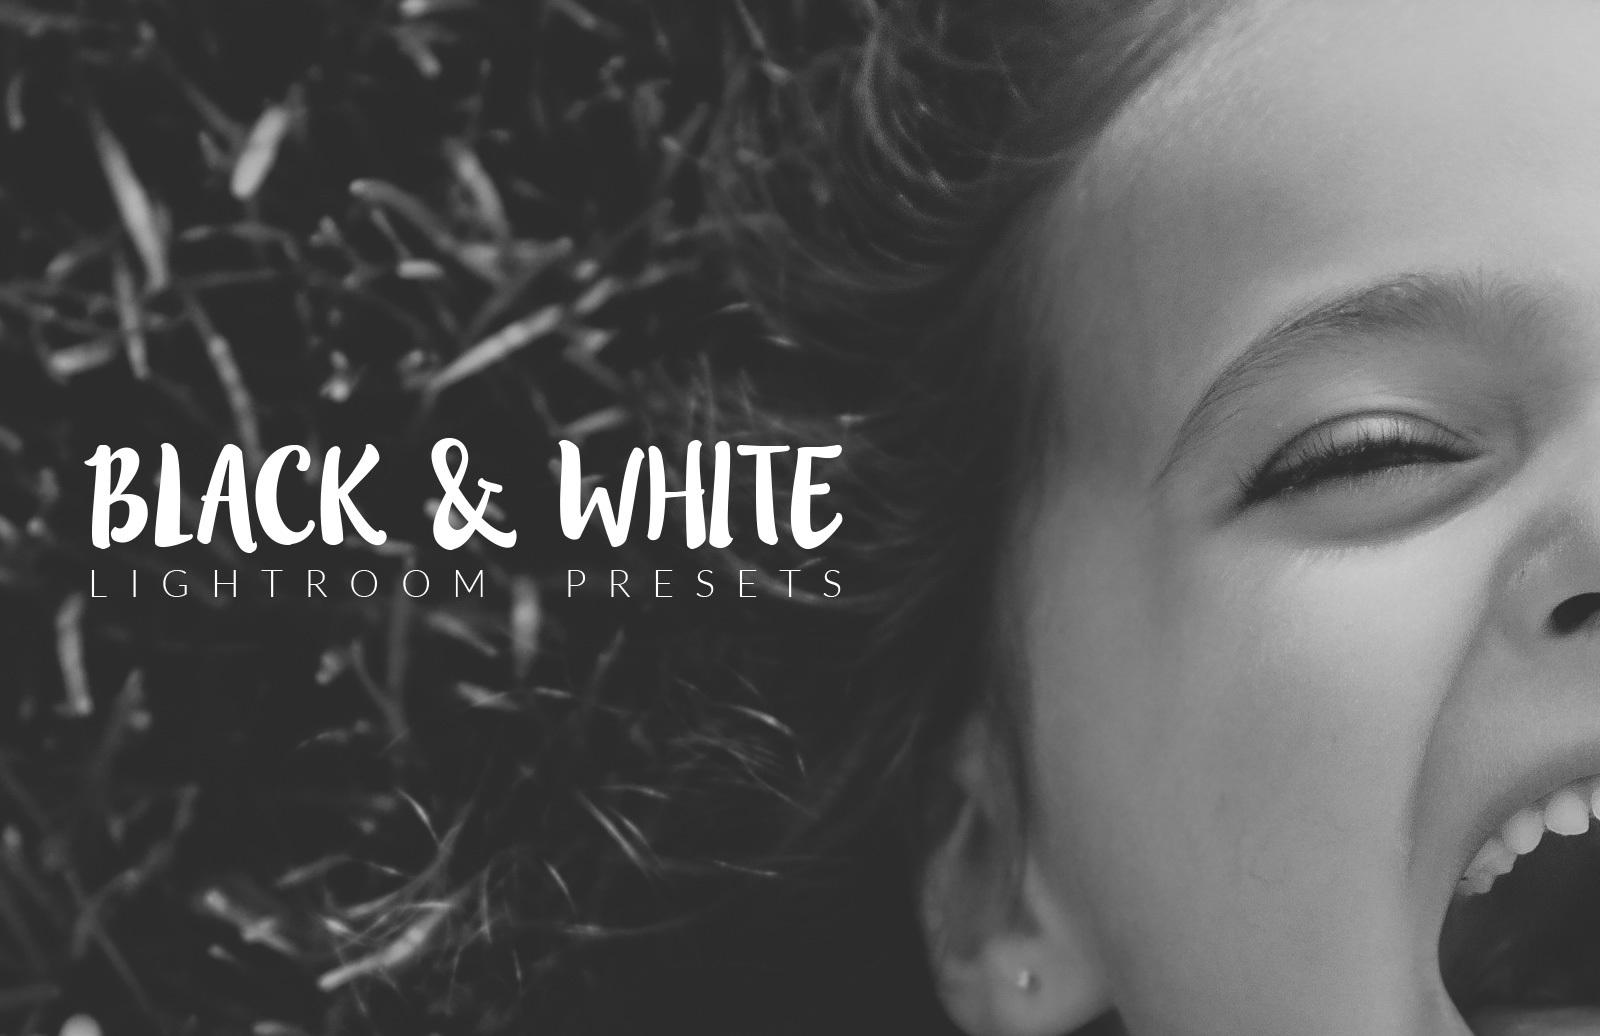 Black and White Lightroom Presets 1